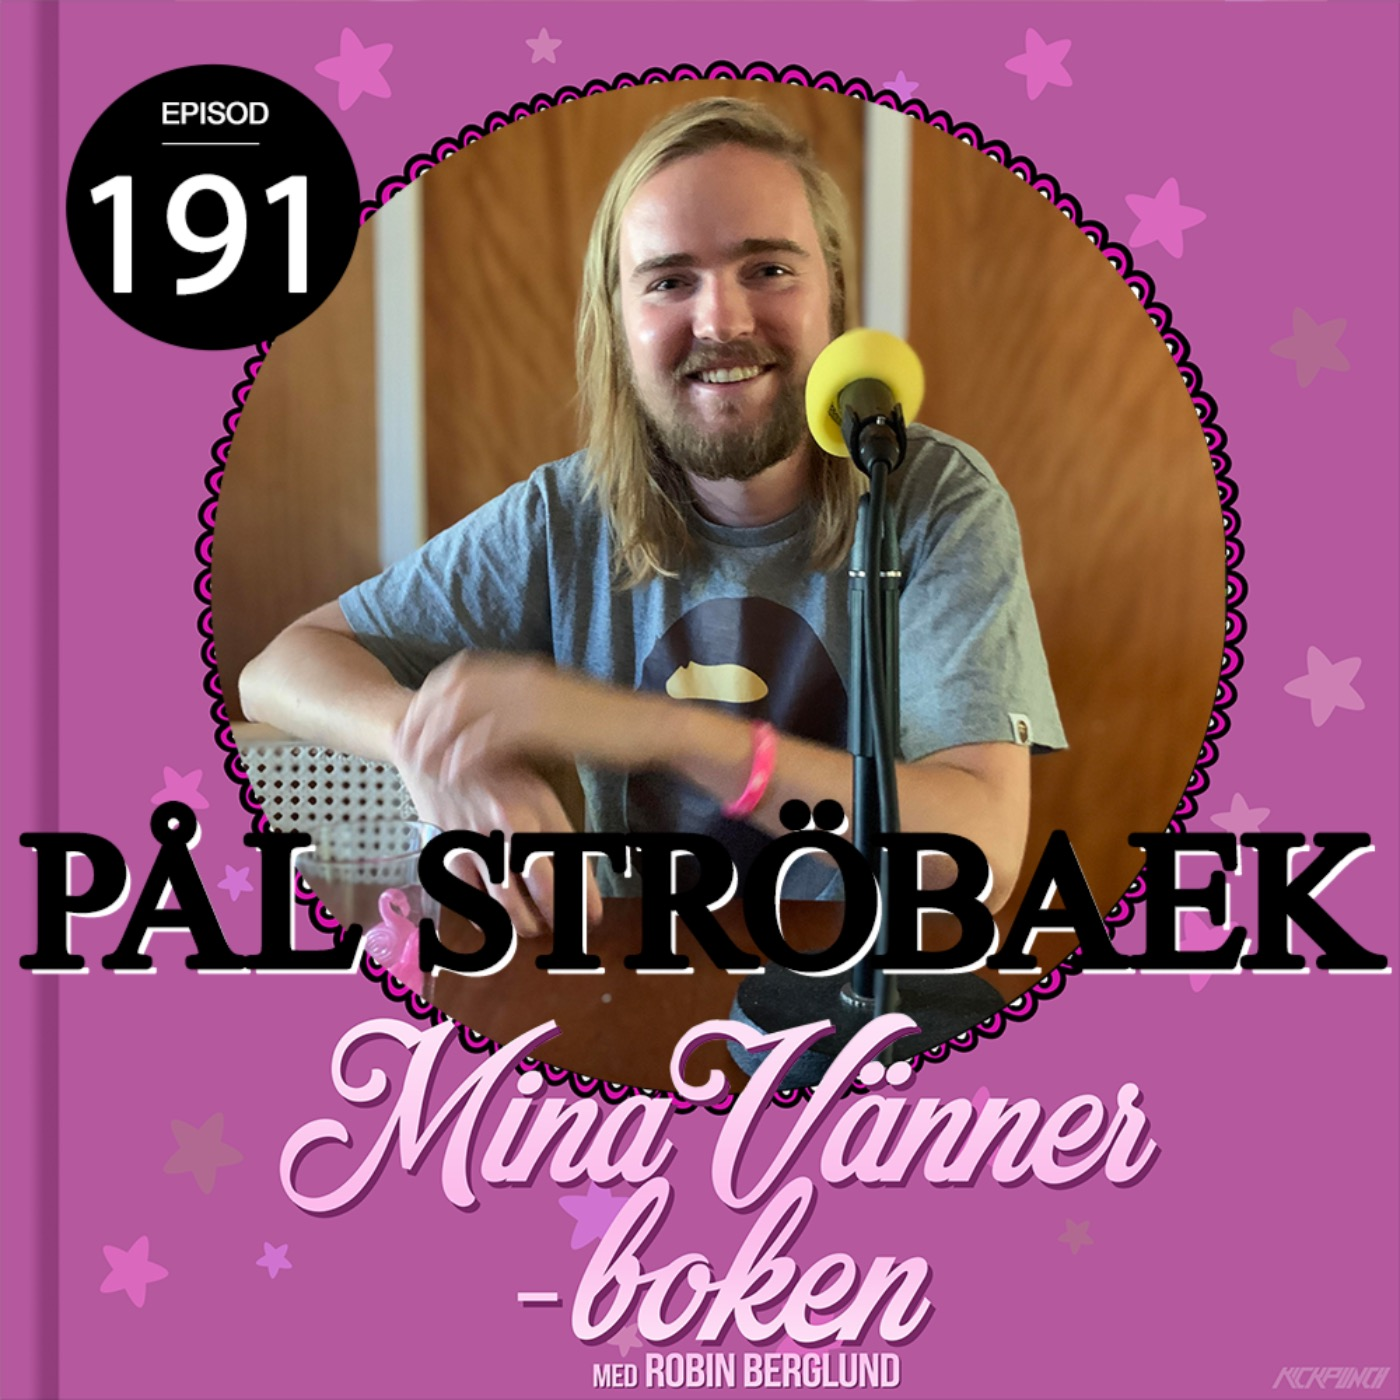 Pål Ströbaek